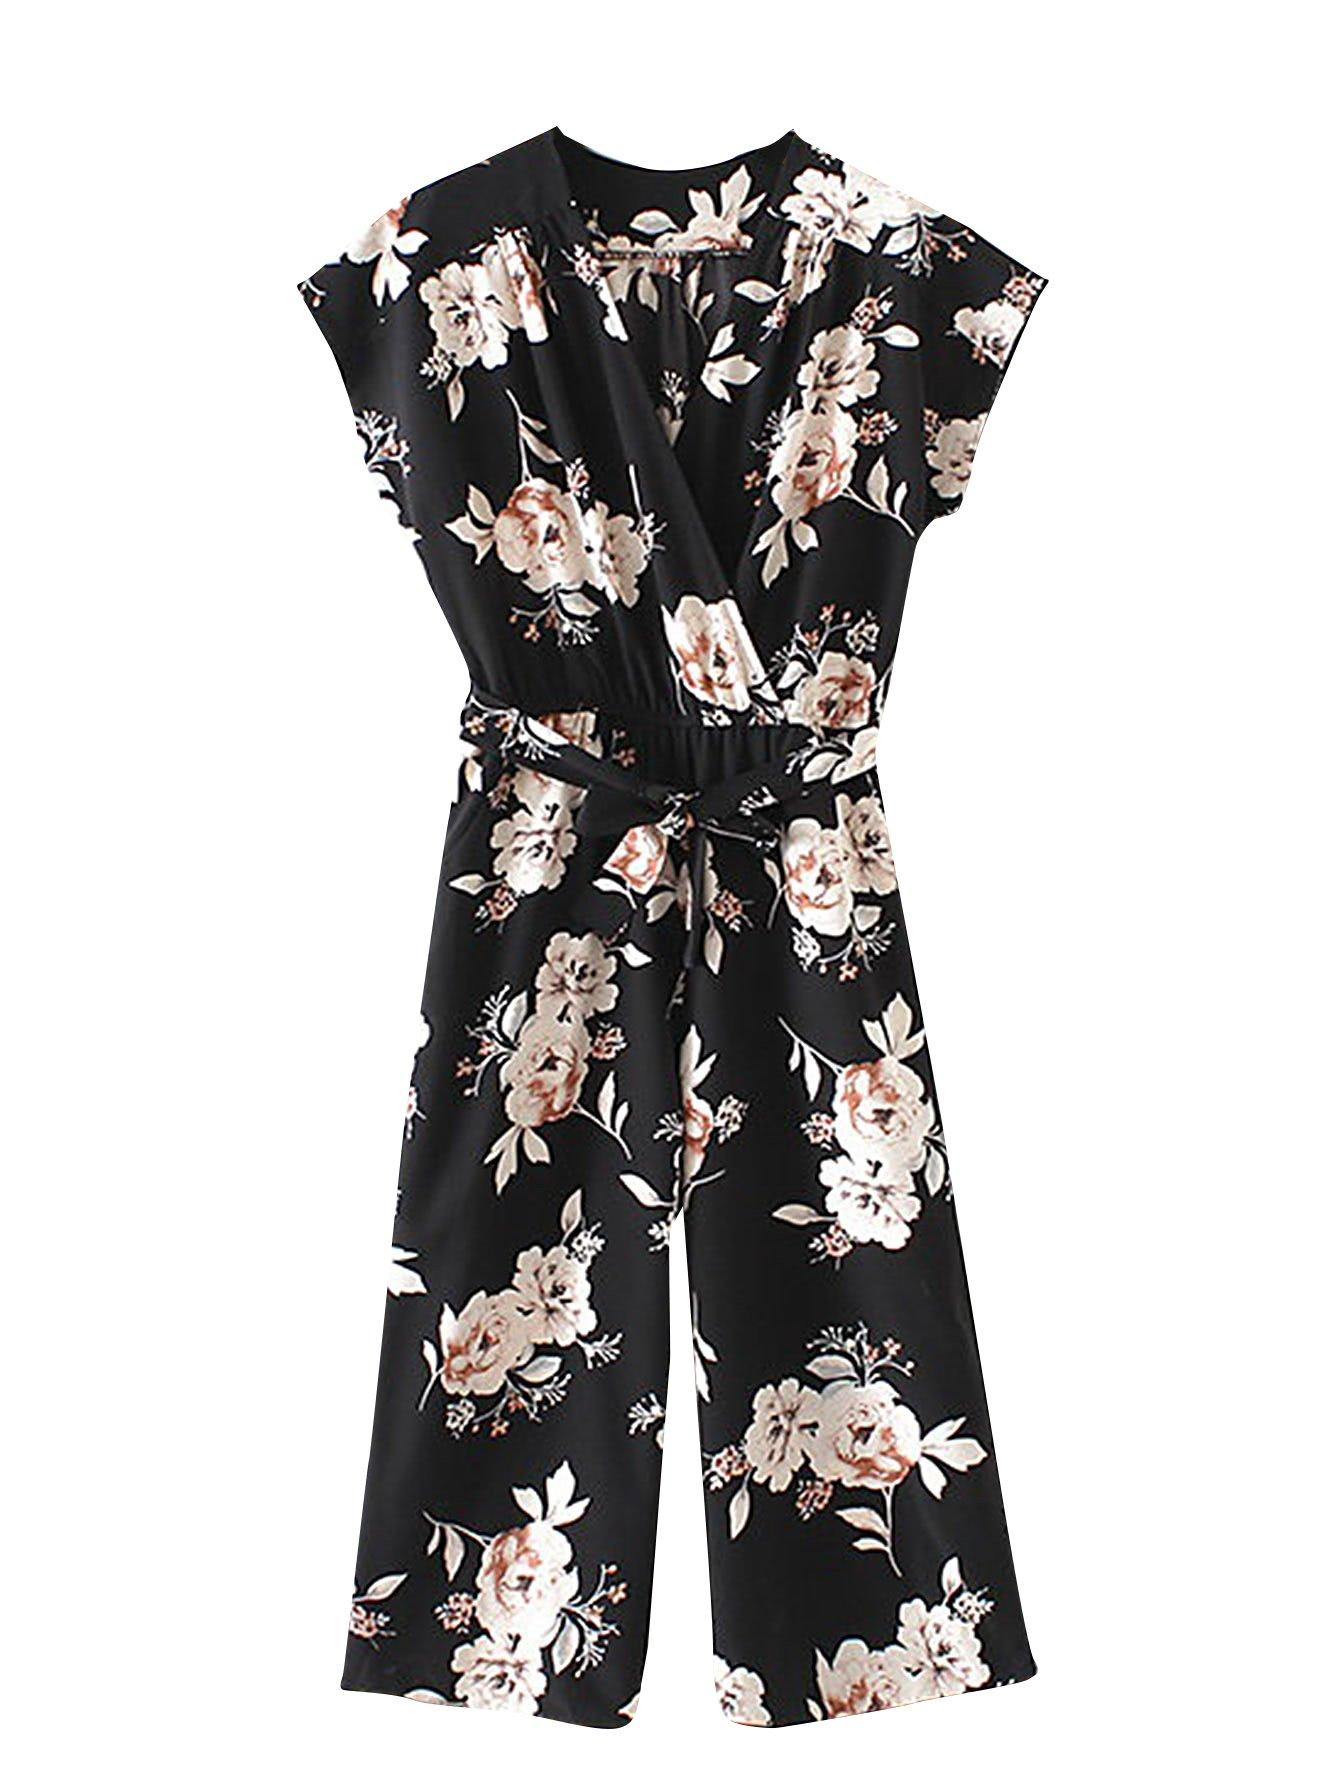 Romwe Women's Floral V Neck Jumpsuit with Self Tie Mid Waist Cap Batwing Sleeve Romper Black S